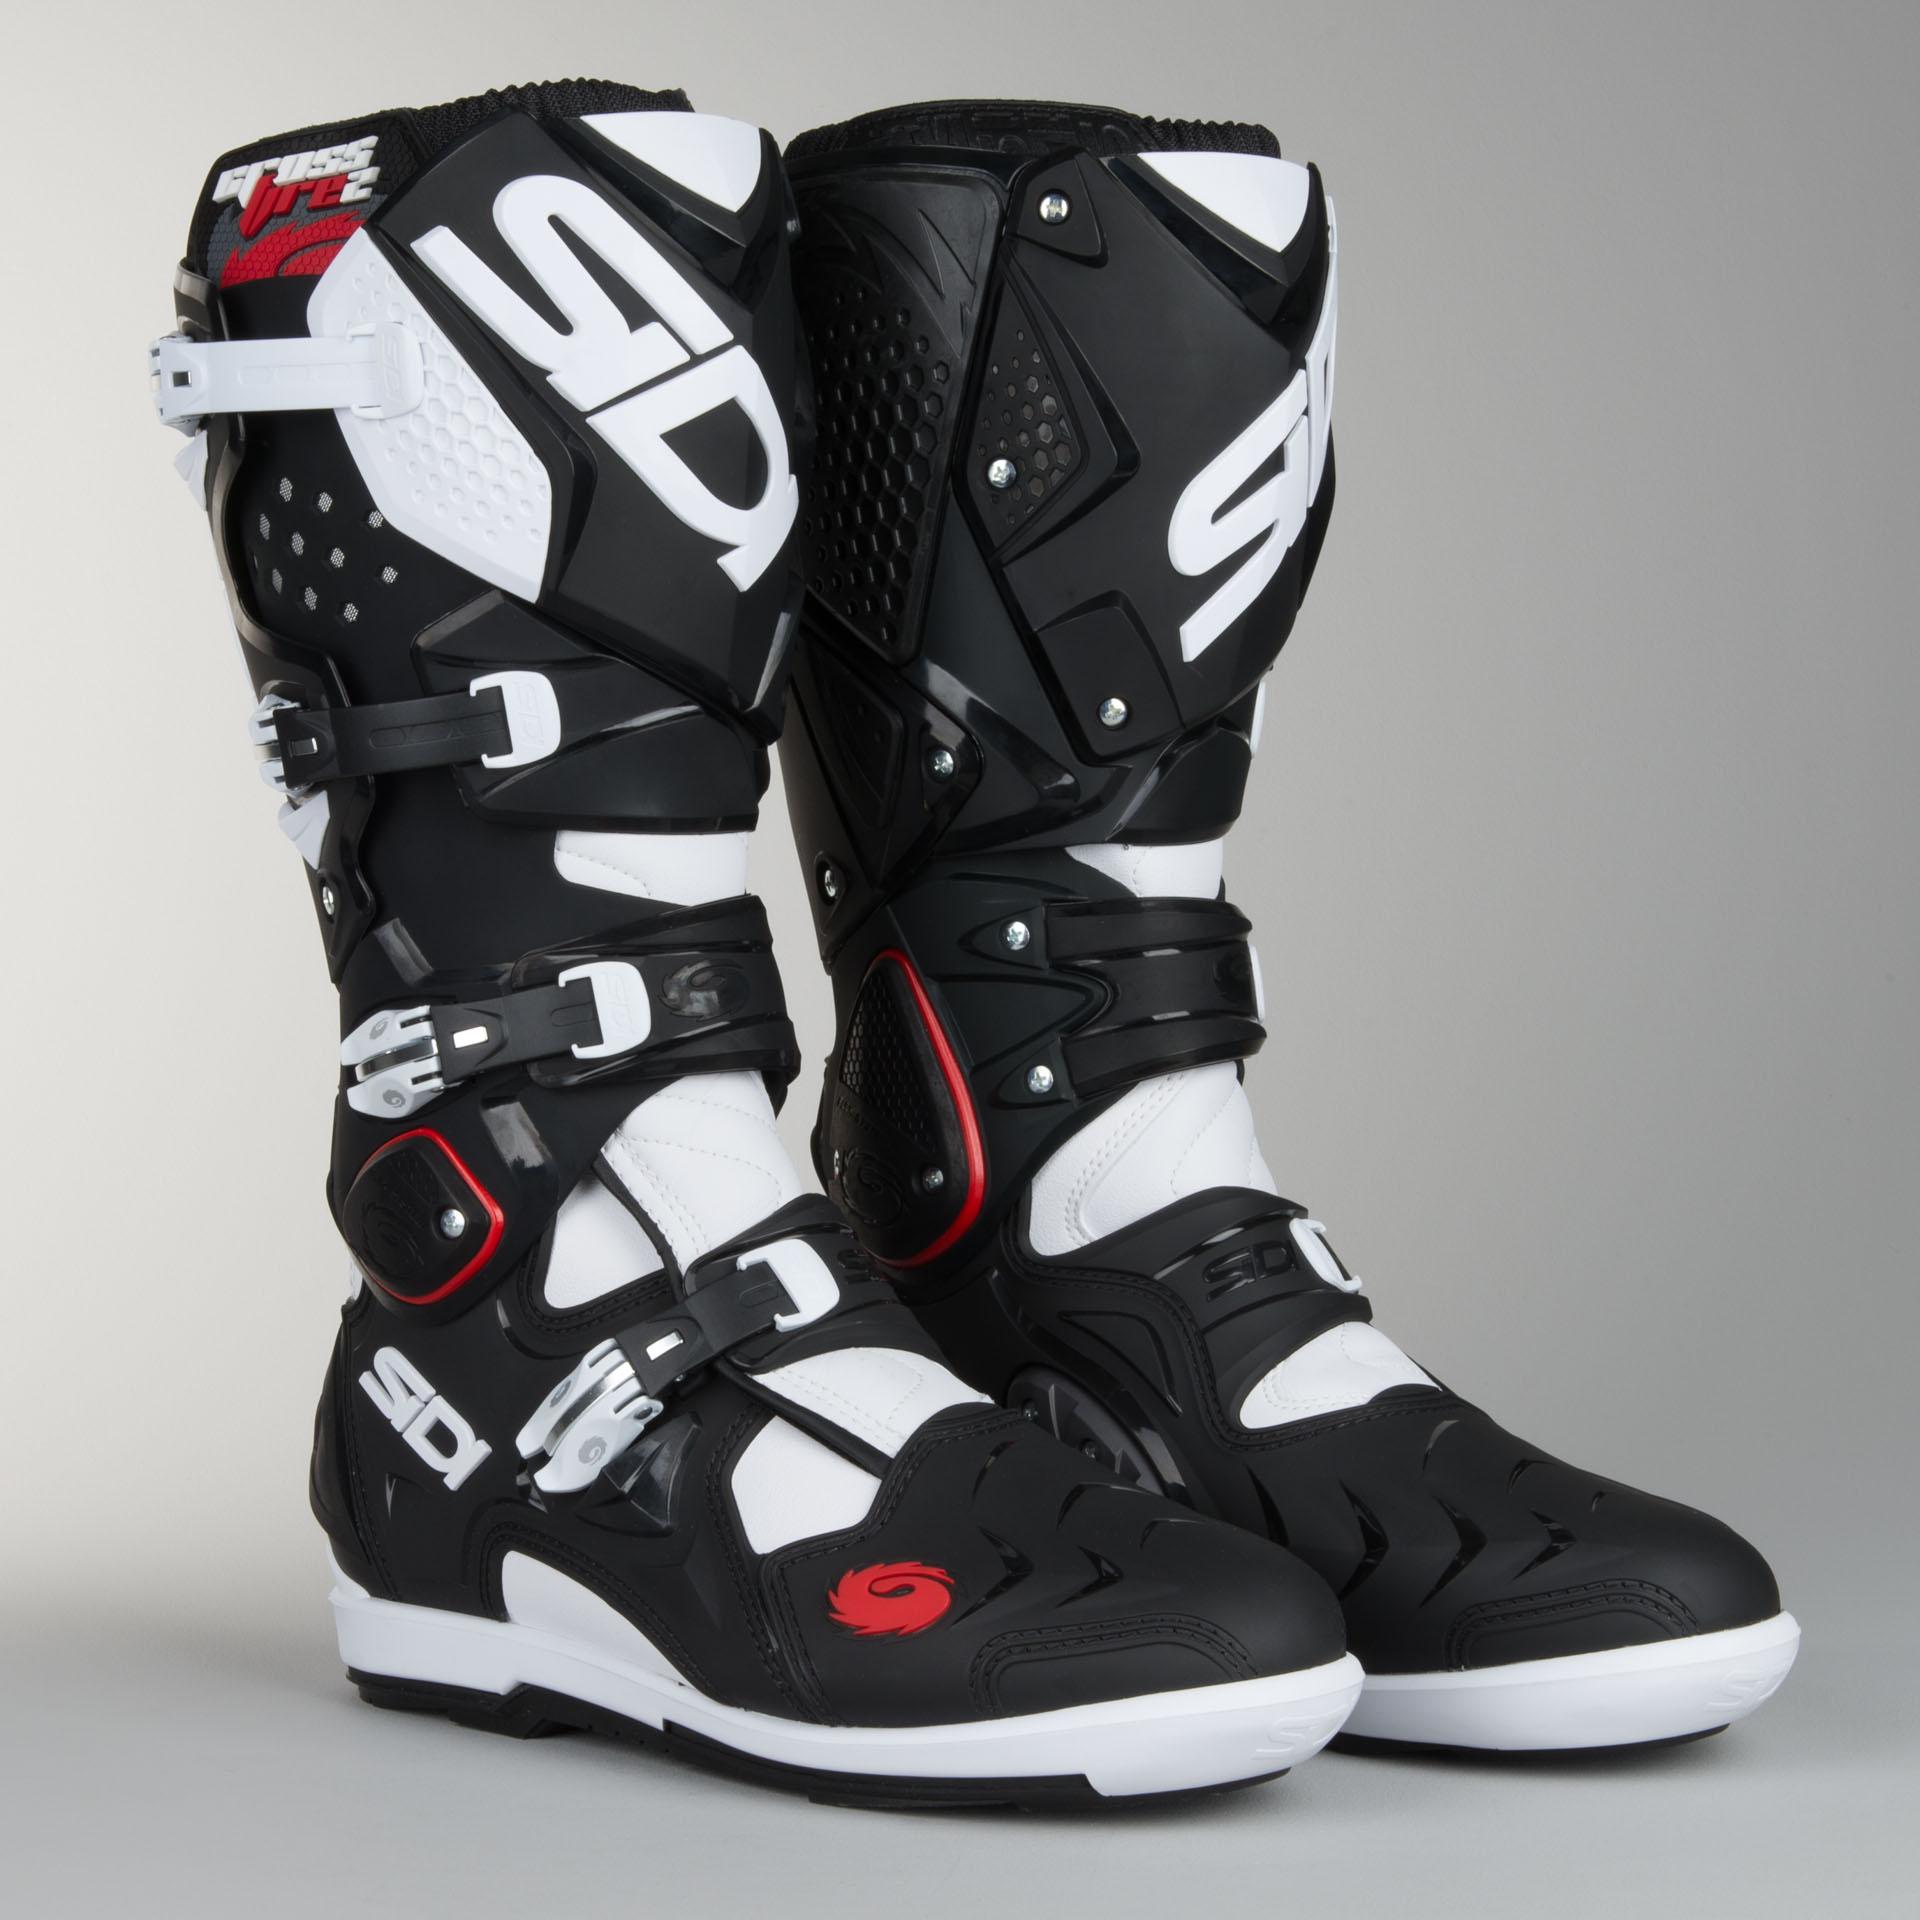 Sidi Crossfire 2 SRS Motocross Boots Black White